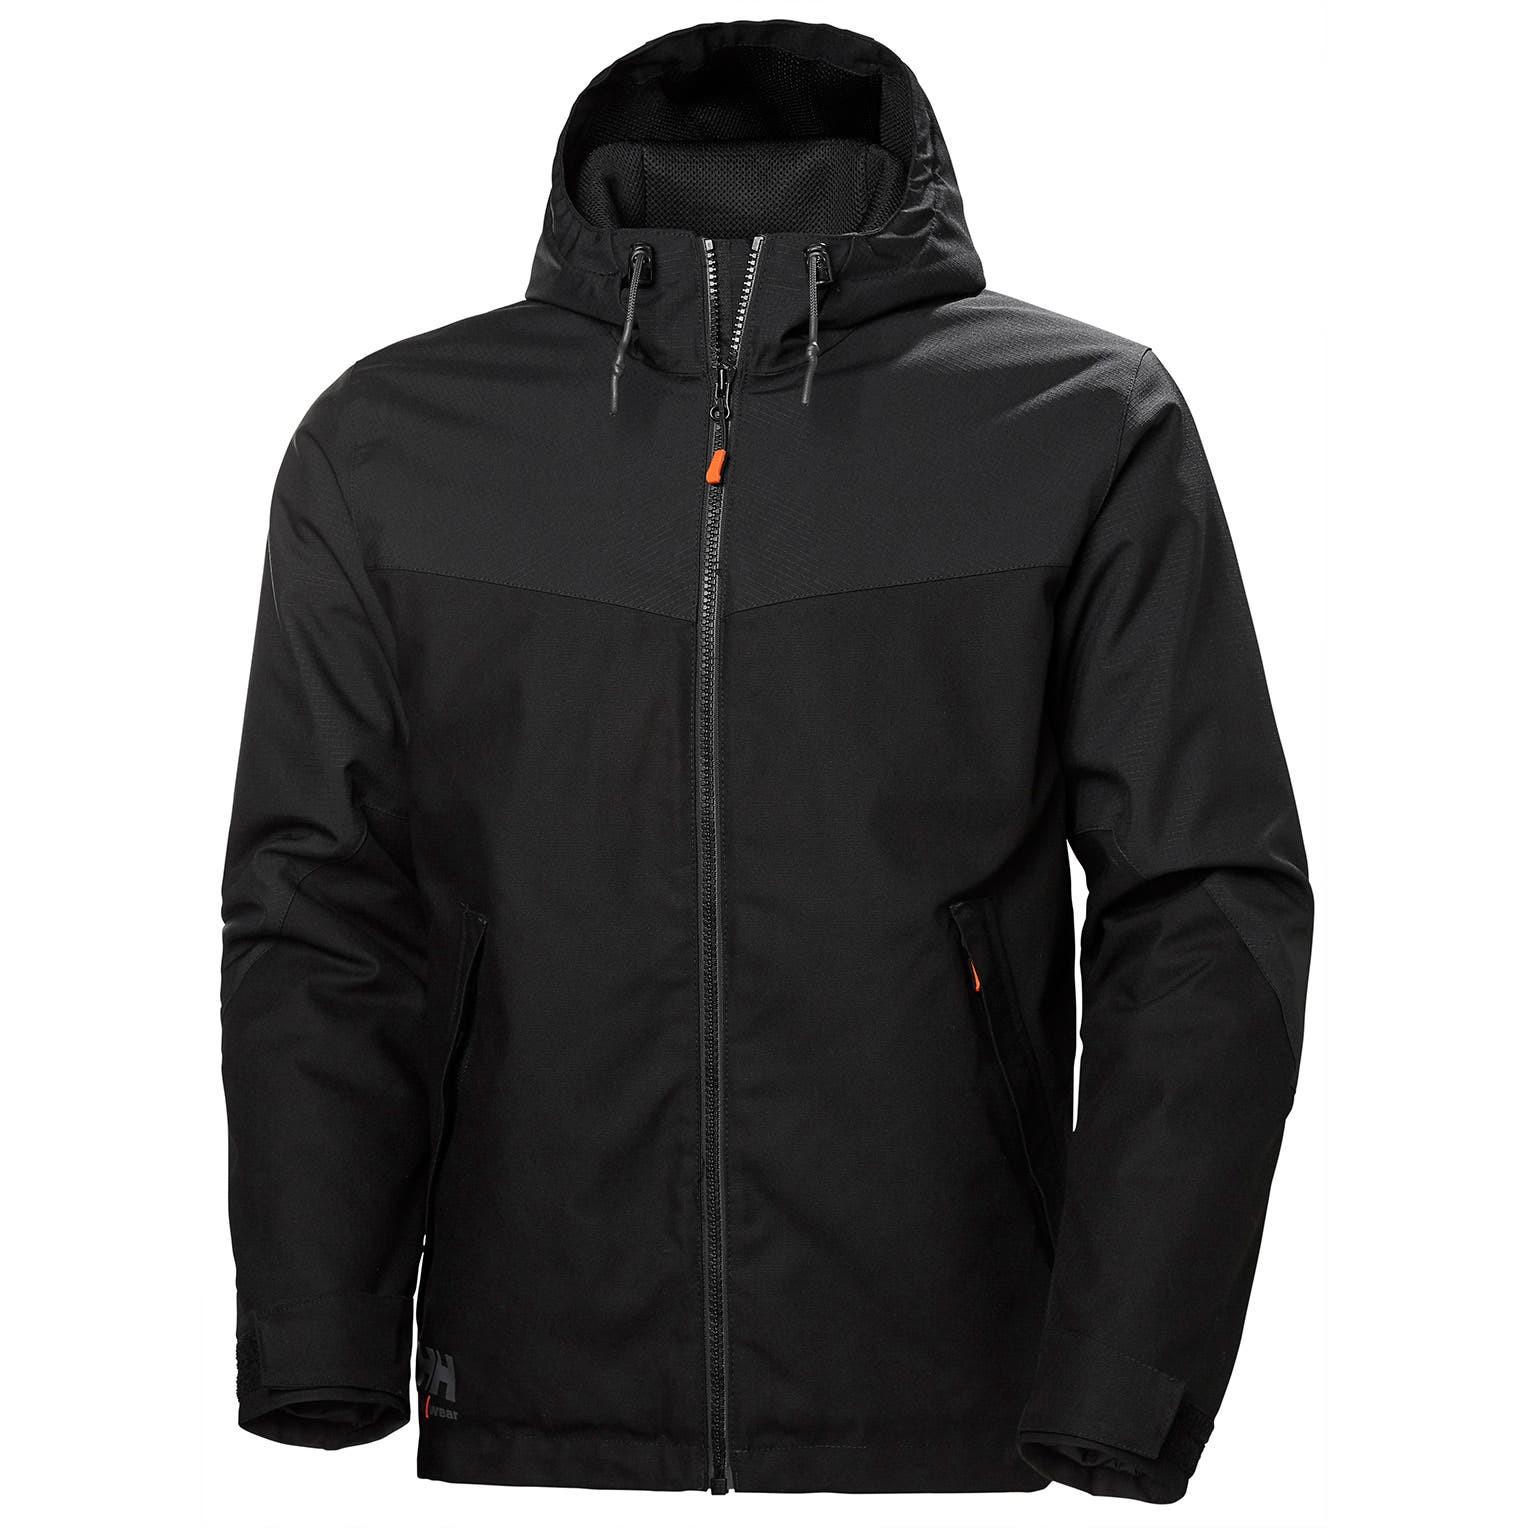 Куртка Helly Hansen Oxford Winter Jacket - 73290 (Black; M)